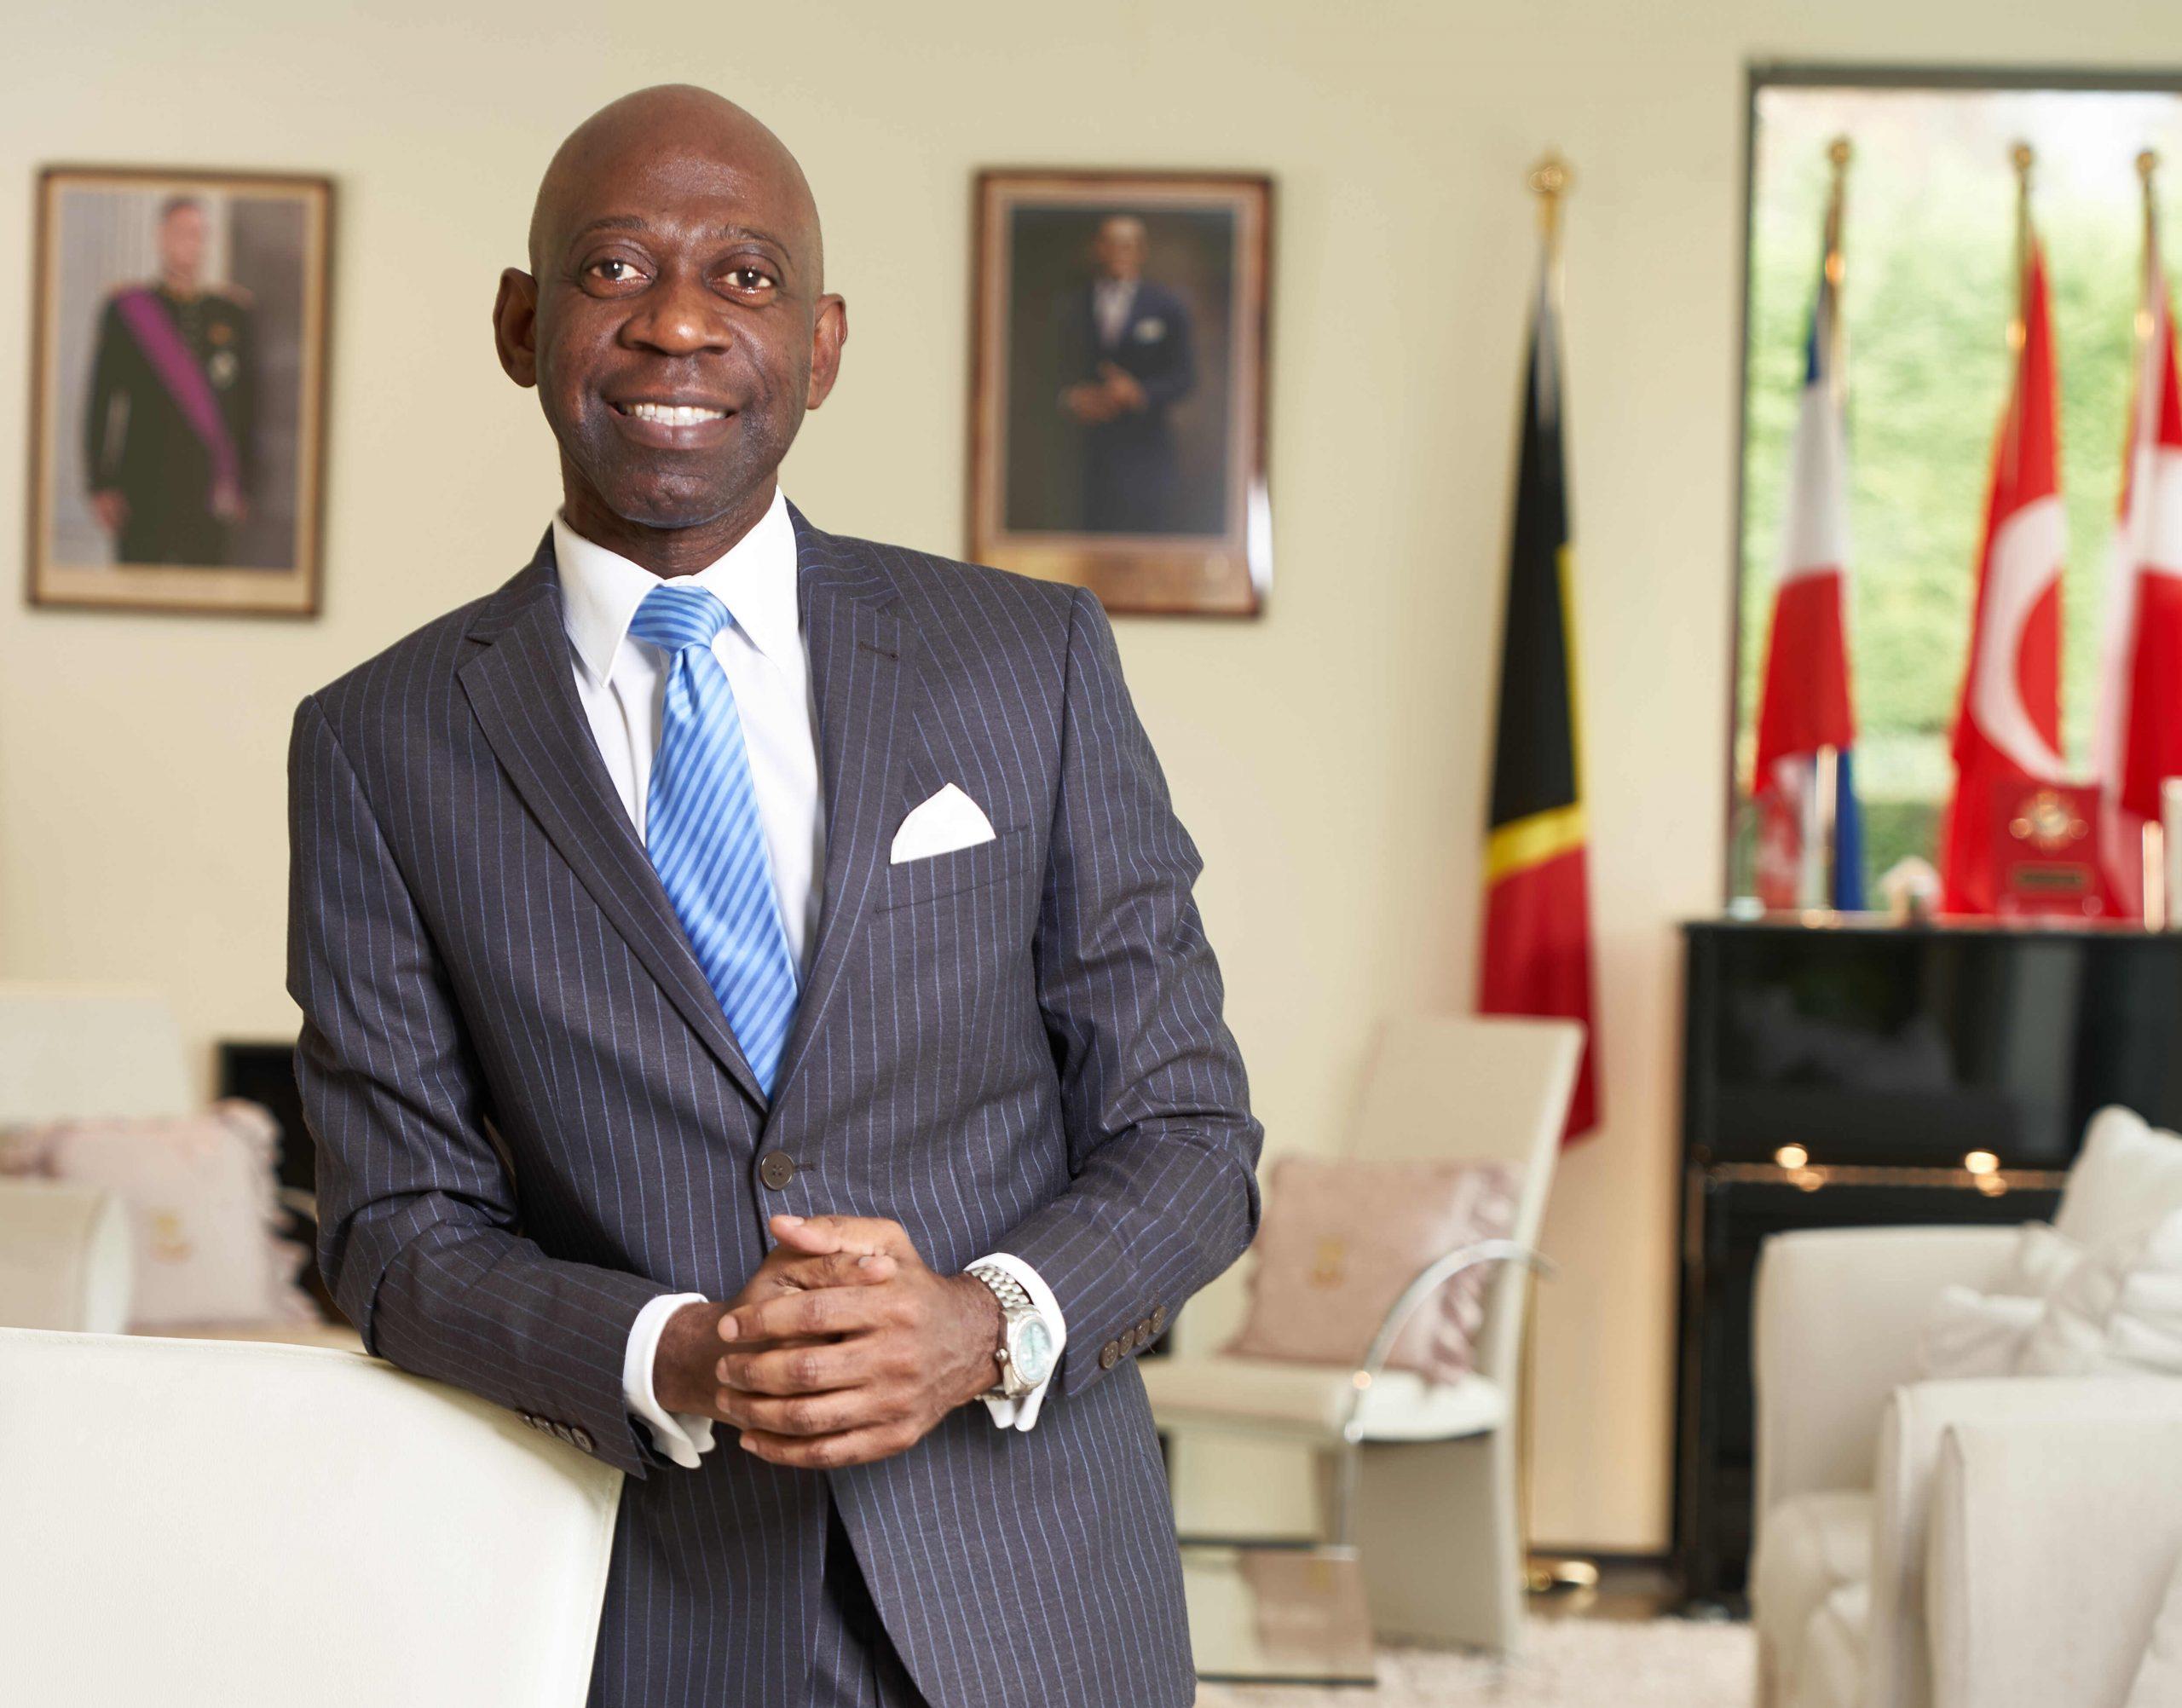 Nvono-Ncá desea Feliz Navidad al Presidente Obiang